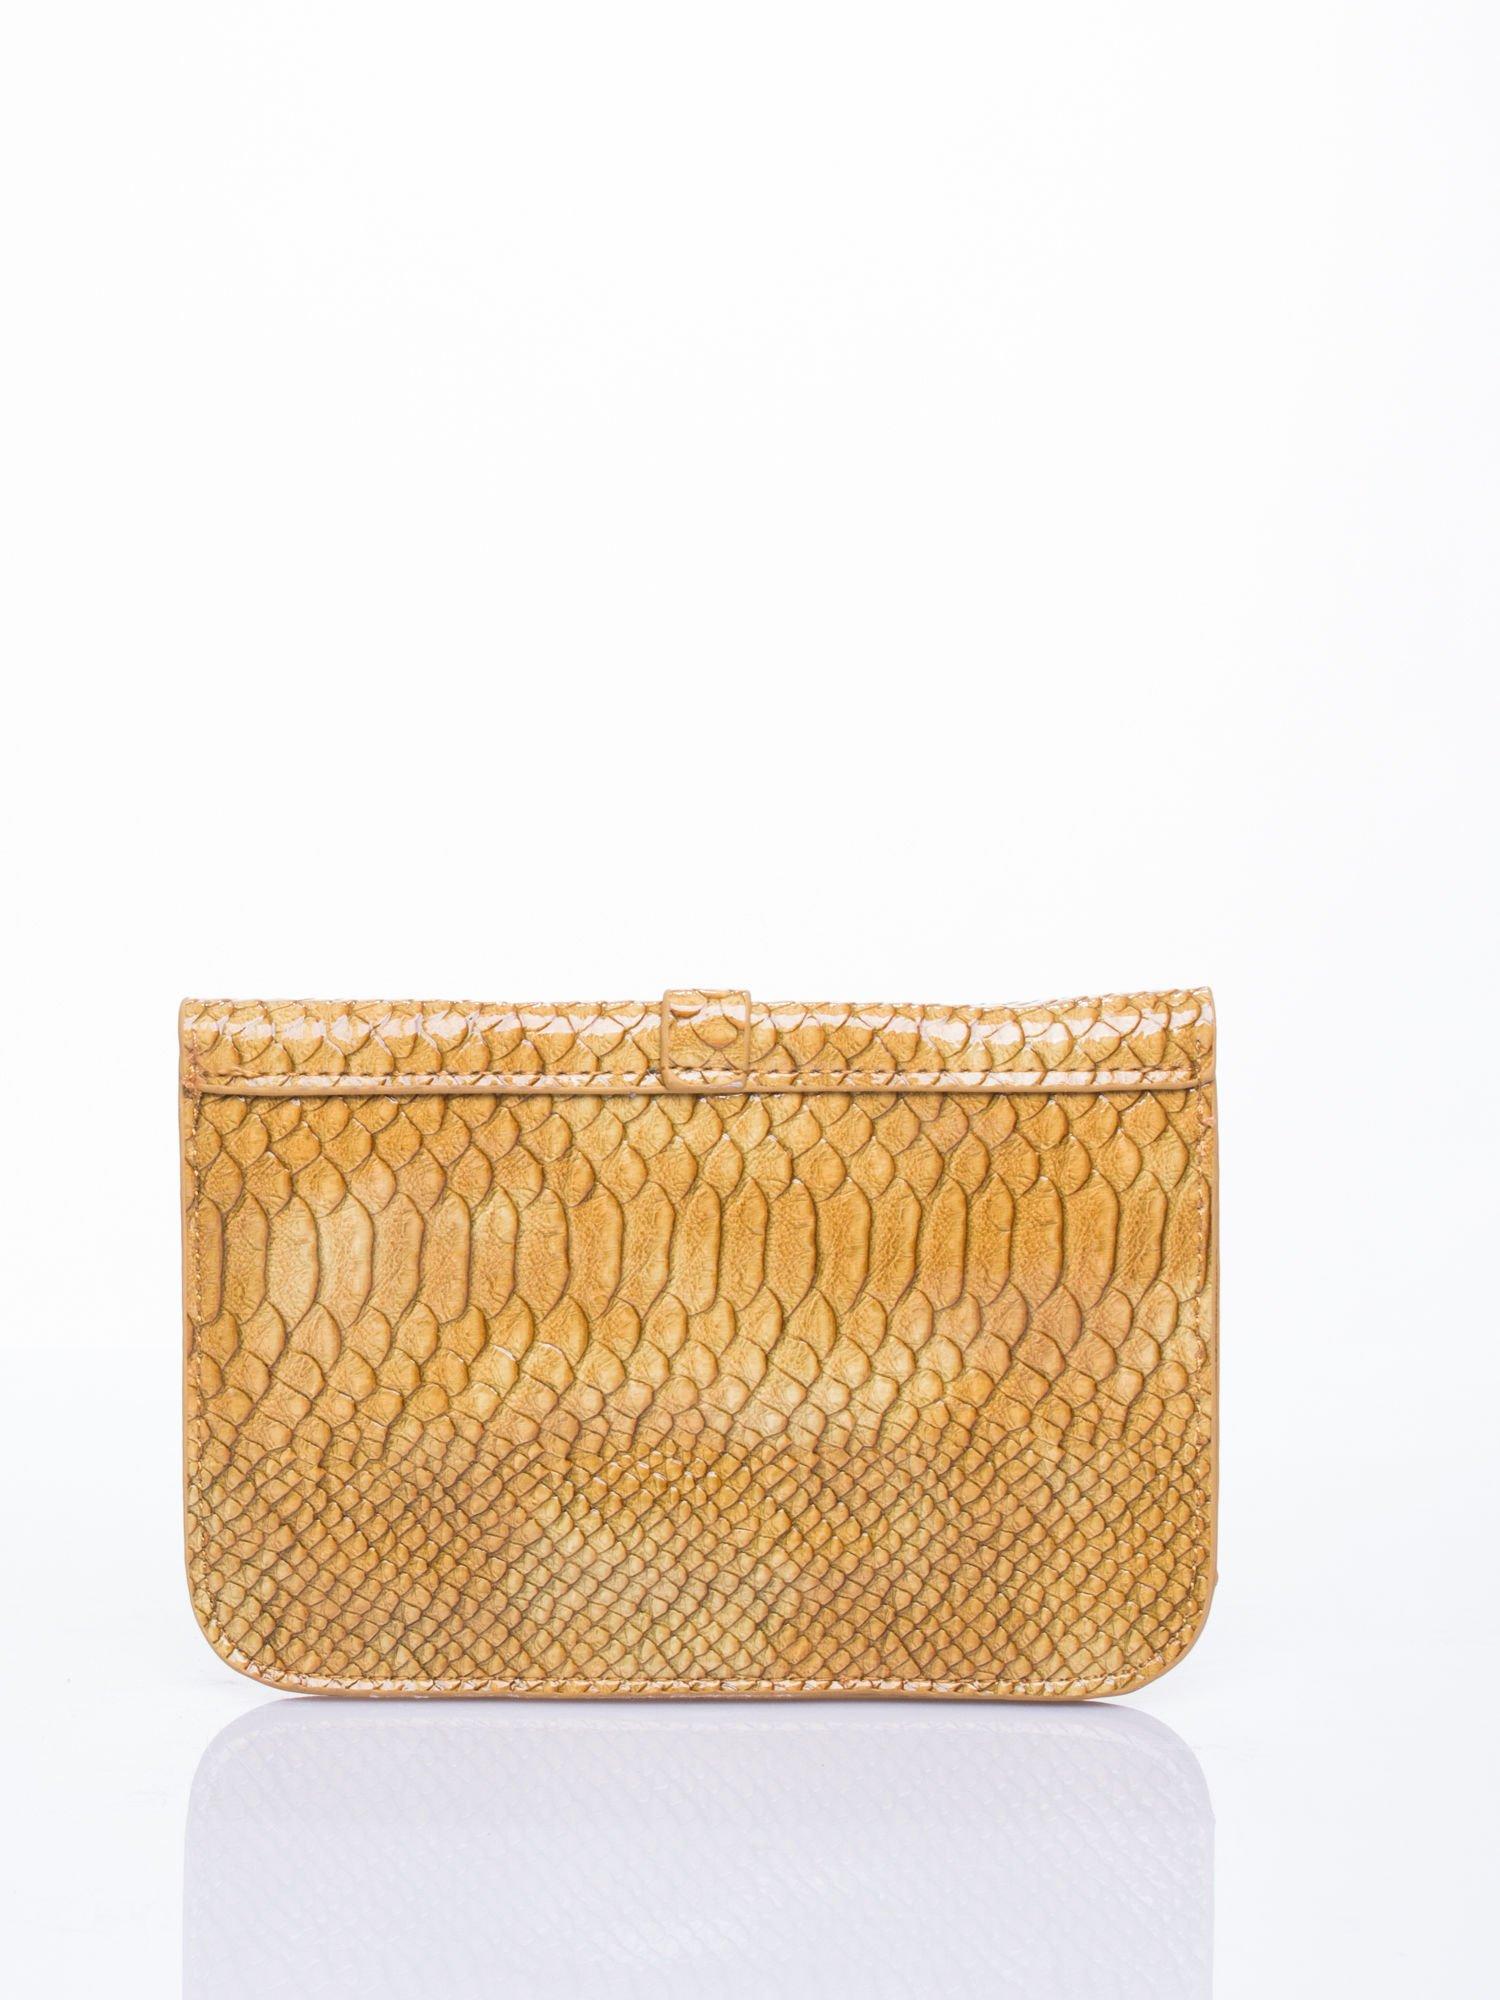 55a01d2423d72 Ciemnożółta kopertówka z motywem skóry krokodyla - Akcesoria torba ...